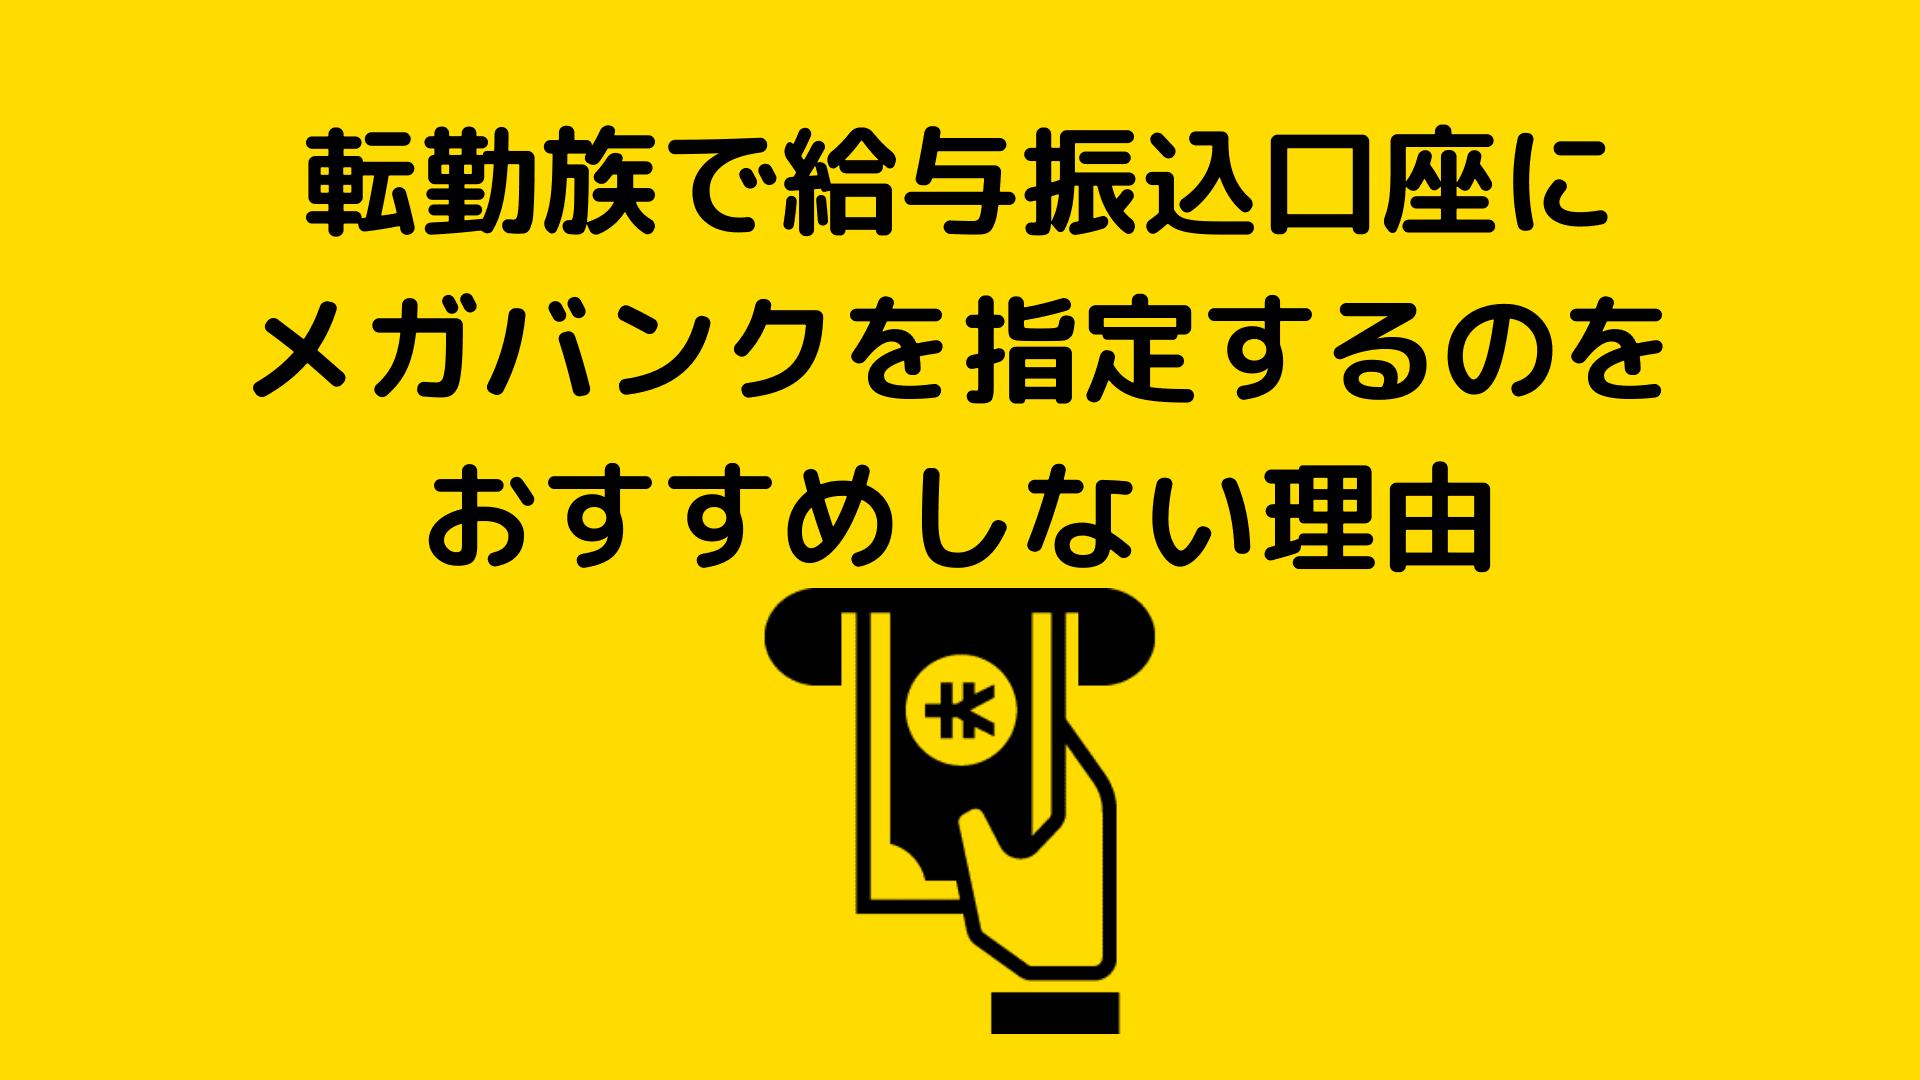 0001 7807373511